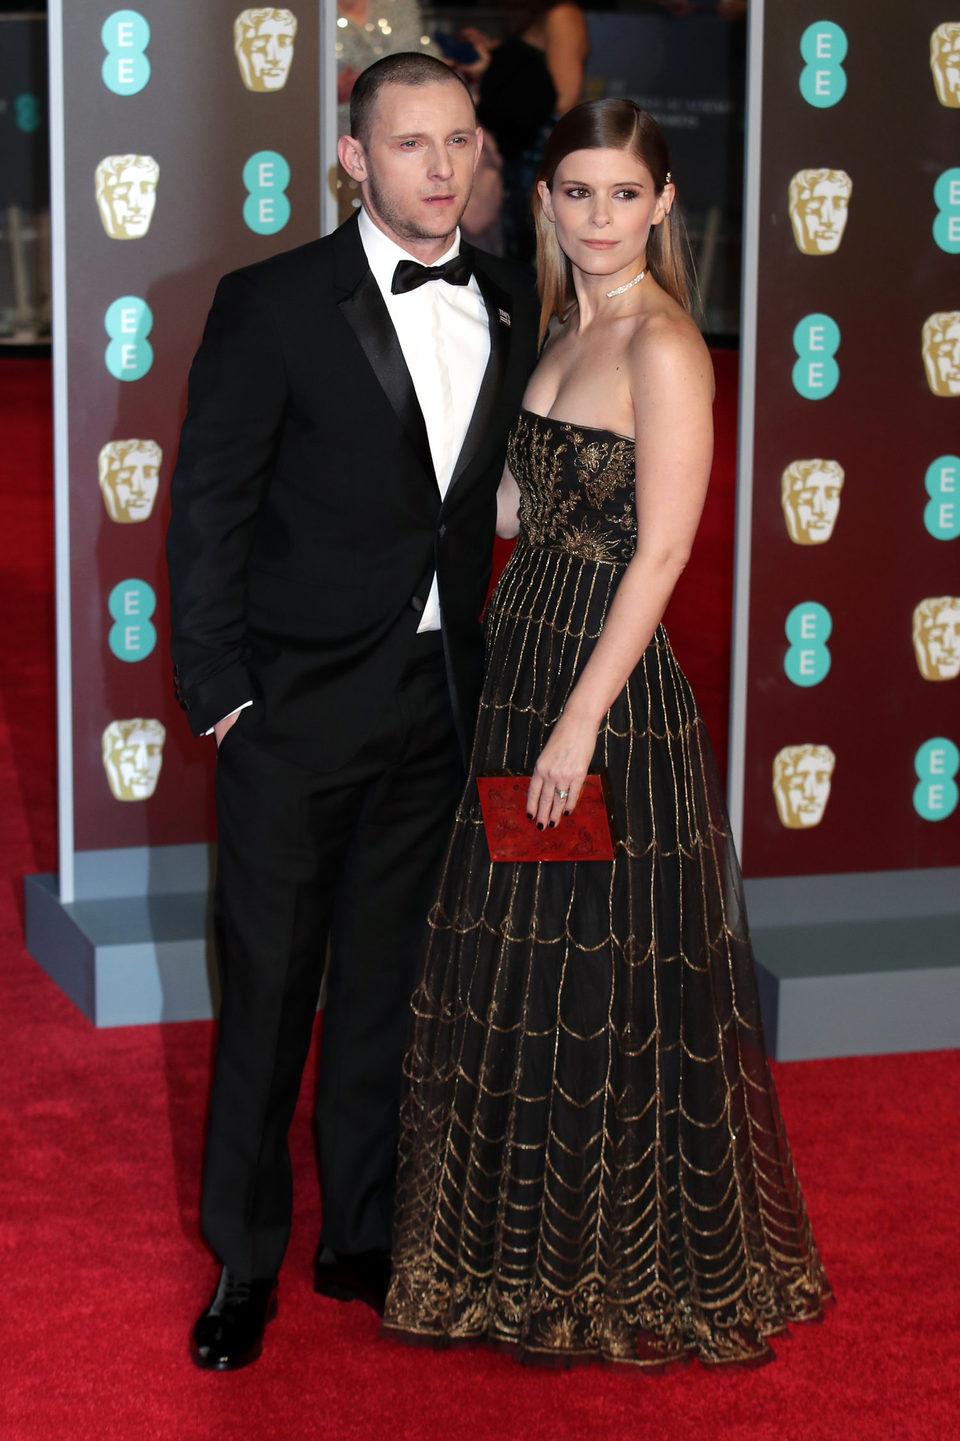 Jamie Bell and Kate Mara at the BAFTA Awards' 2018 red carpet